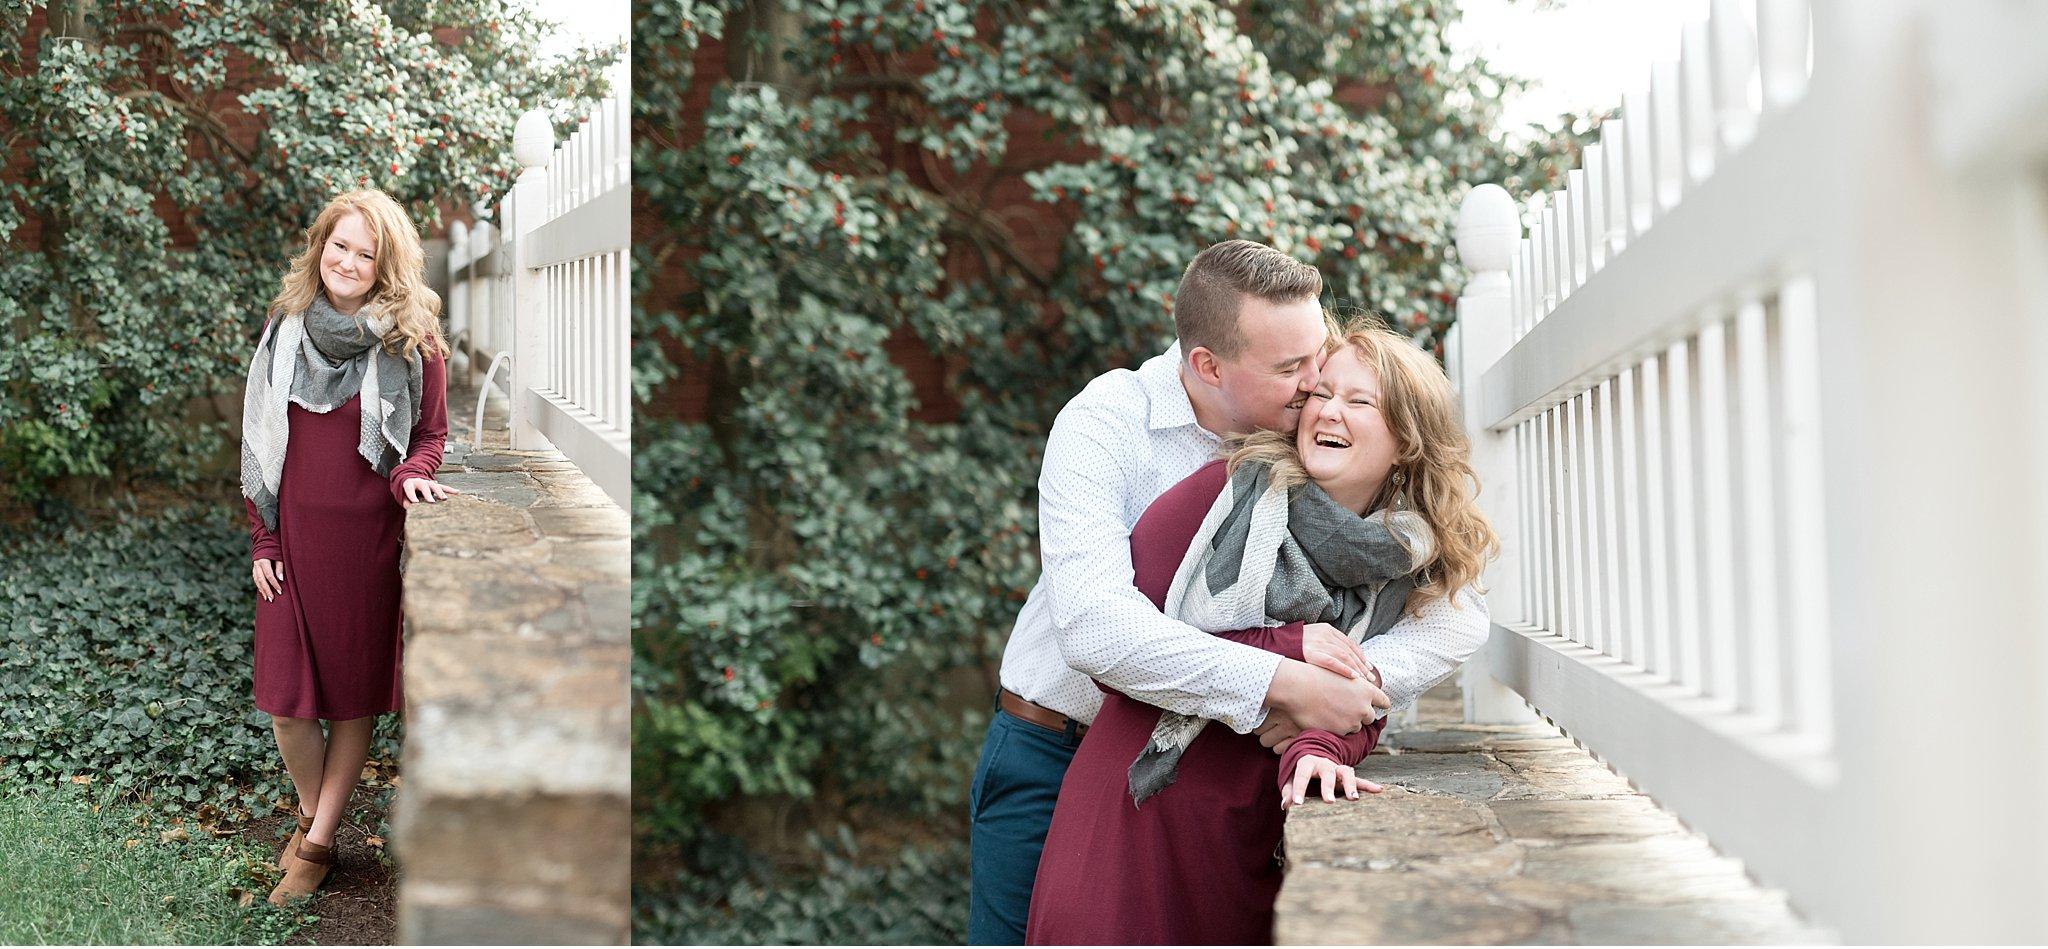 Winter engagement session Lancaster City Wedding Photographer photo